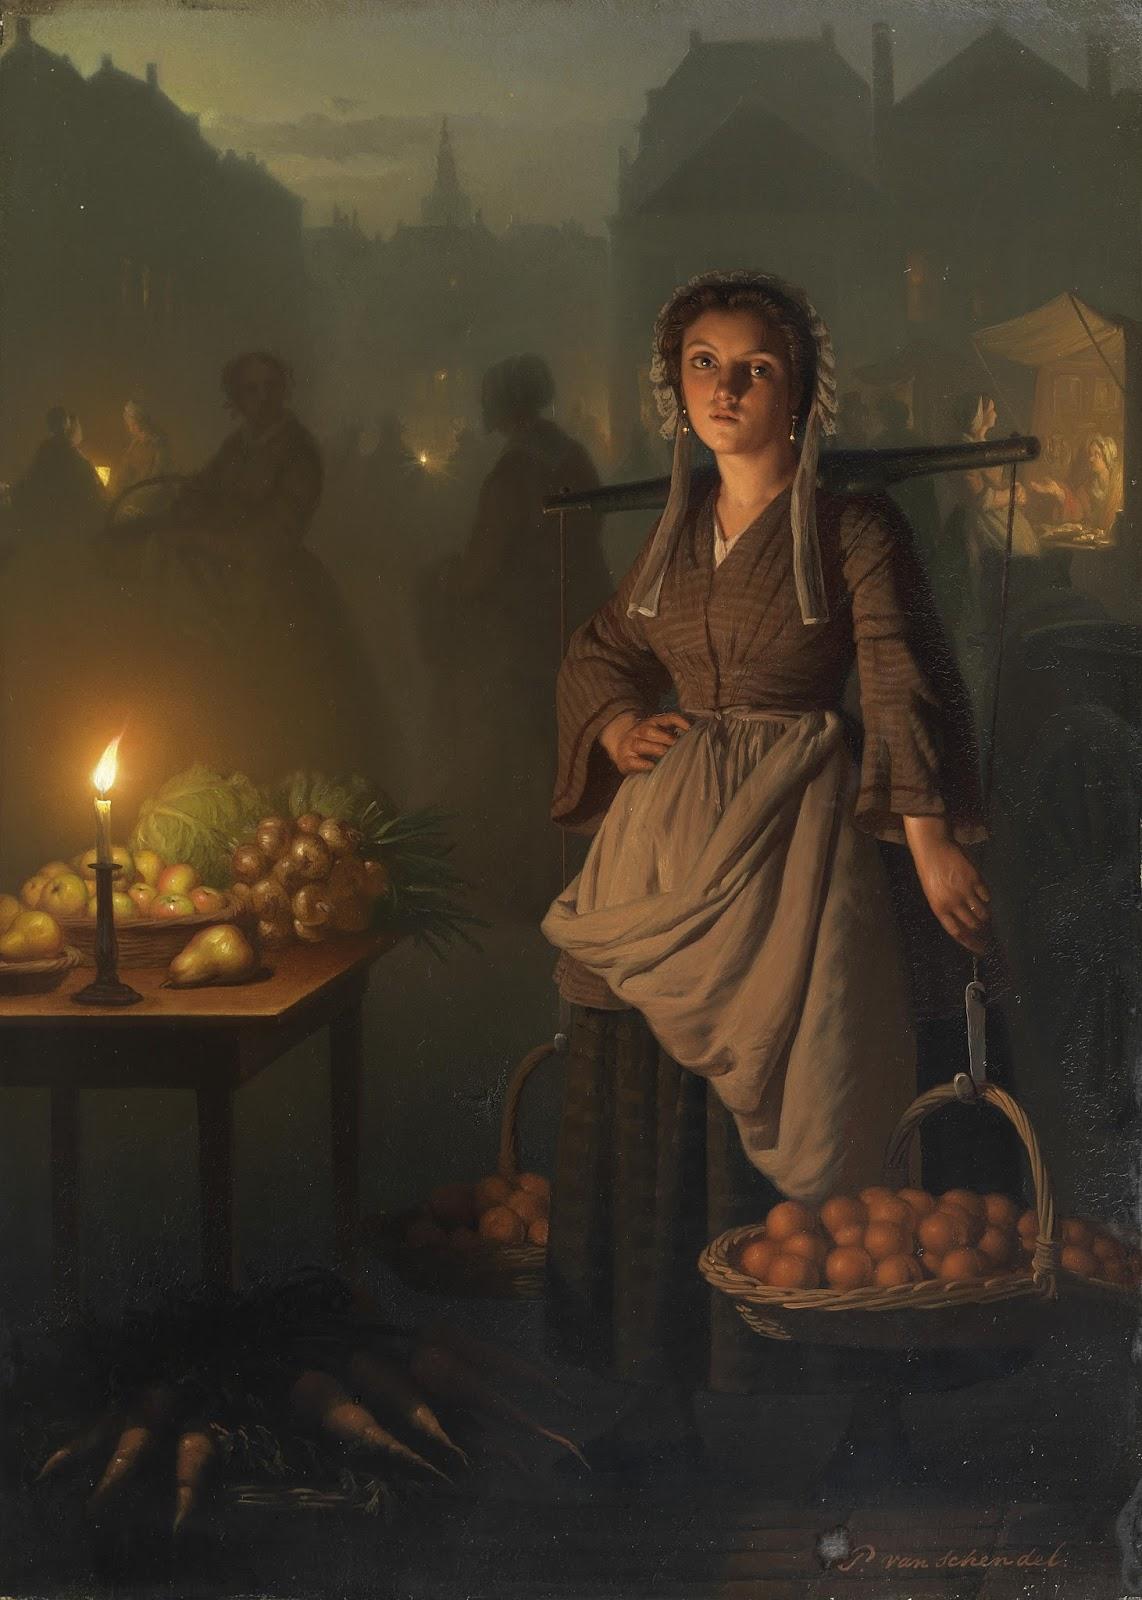 Mercado à Luz de Vela - Petrus van Schendel e suas pinturas ~ Especialista em cena noturna